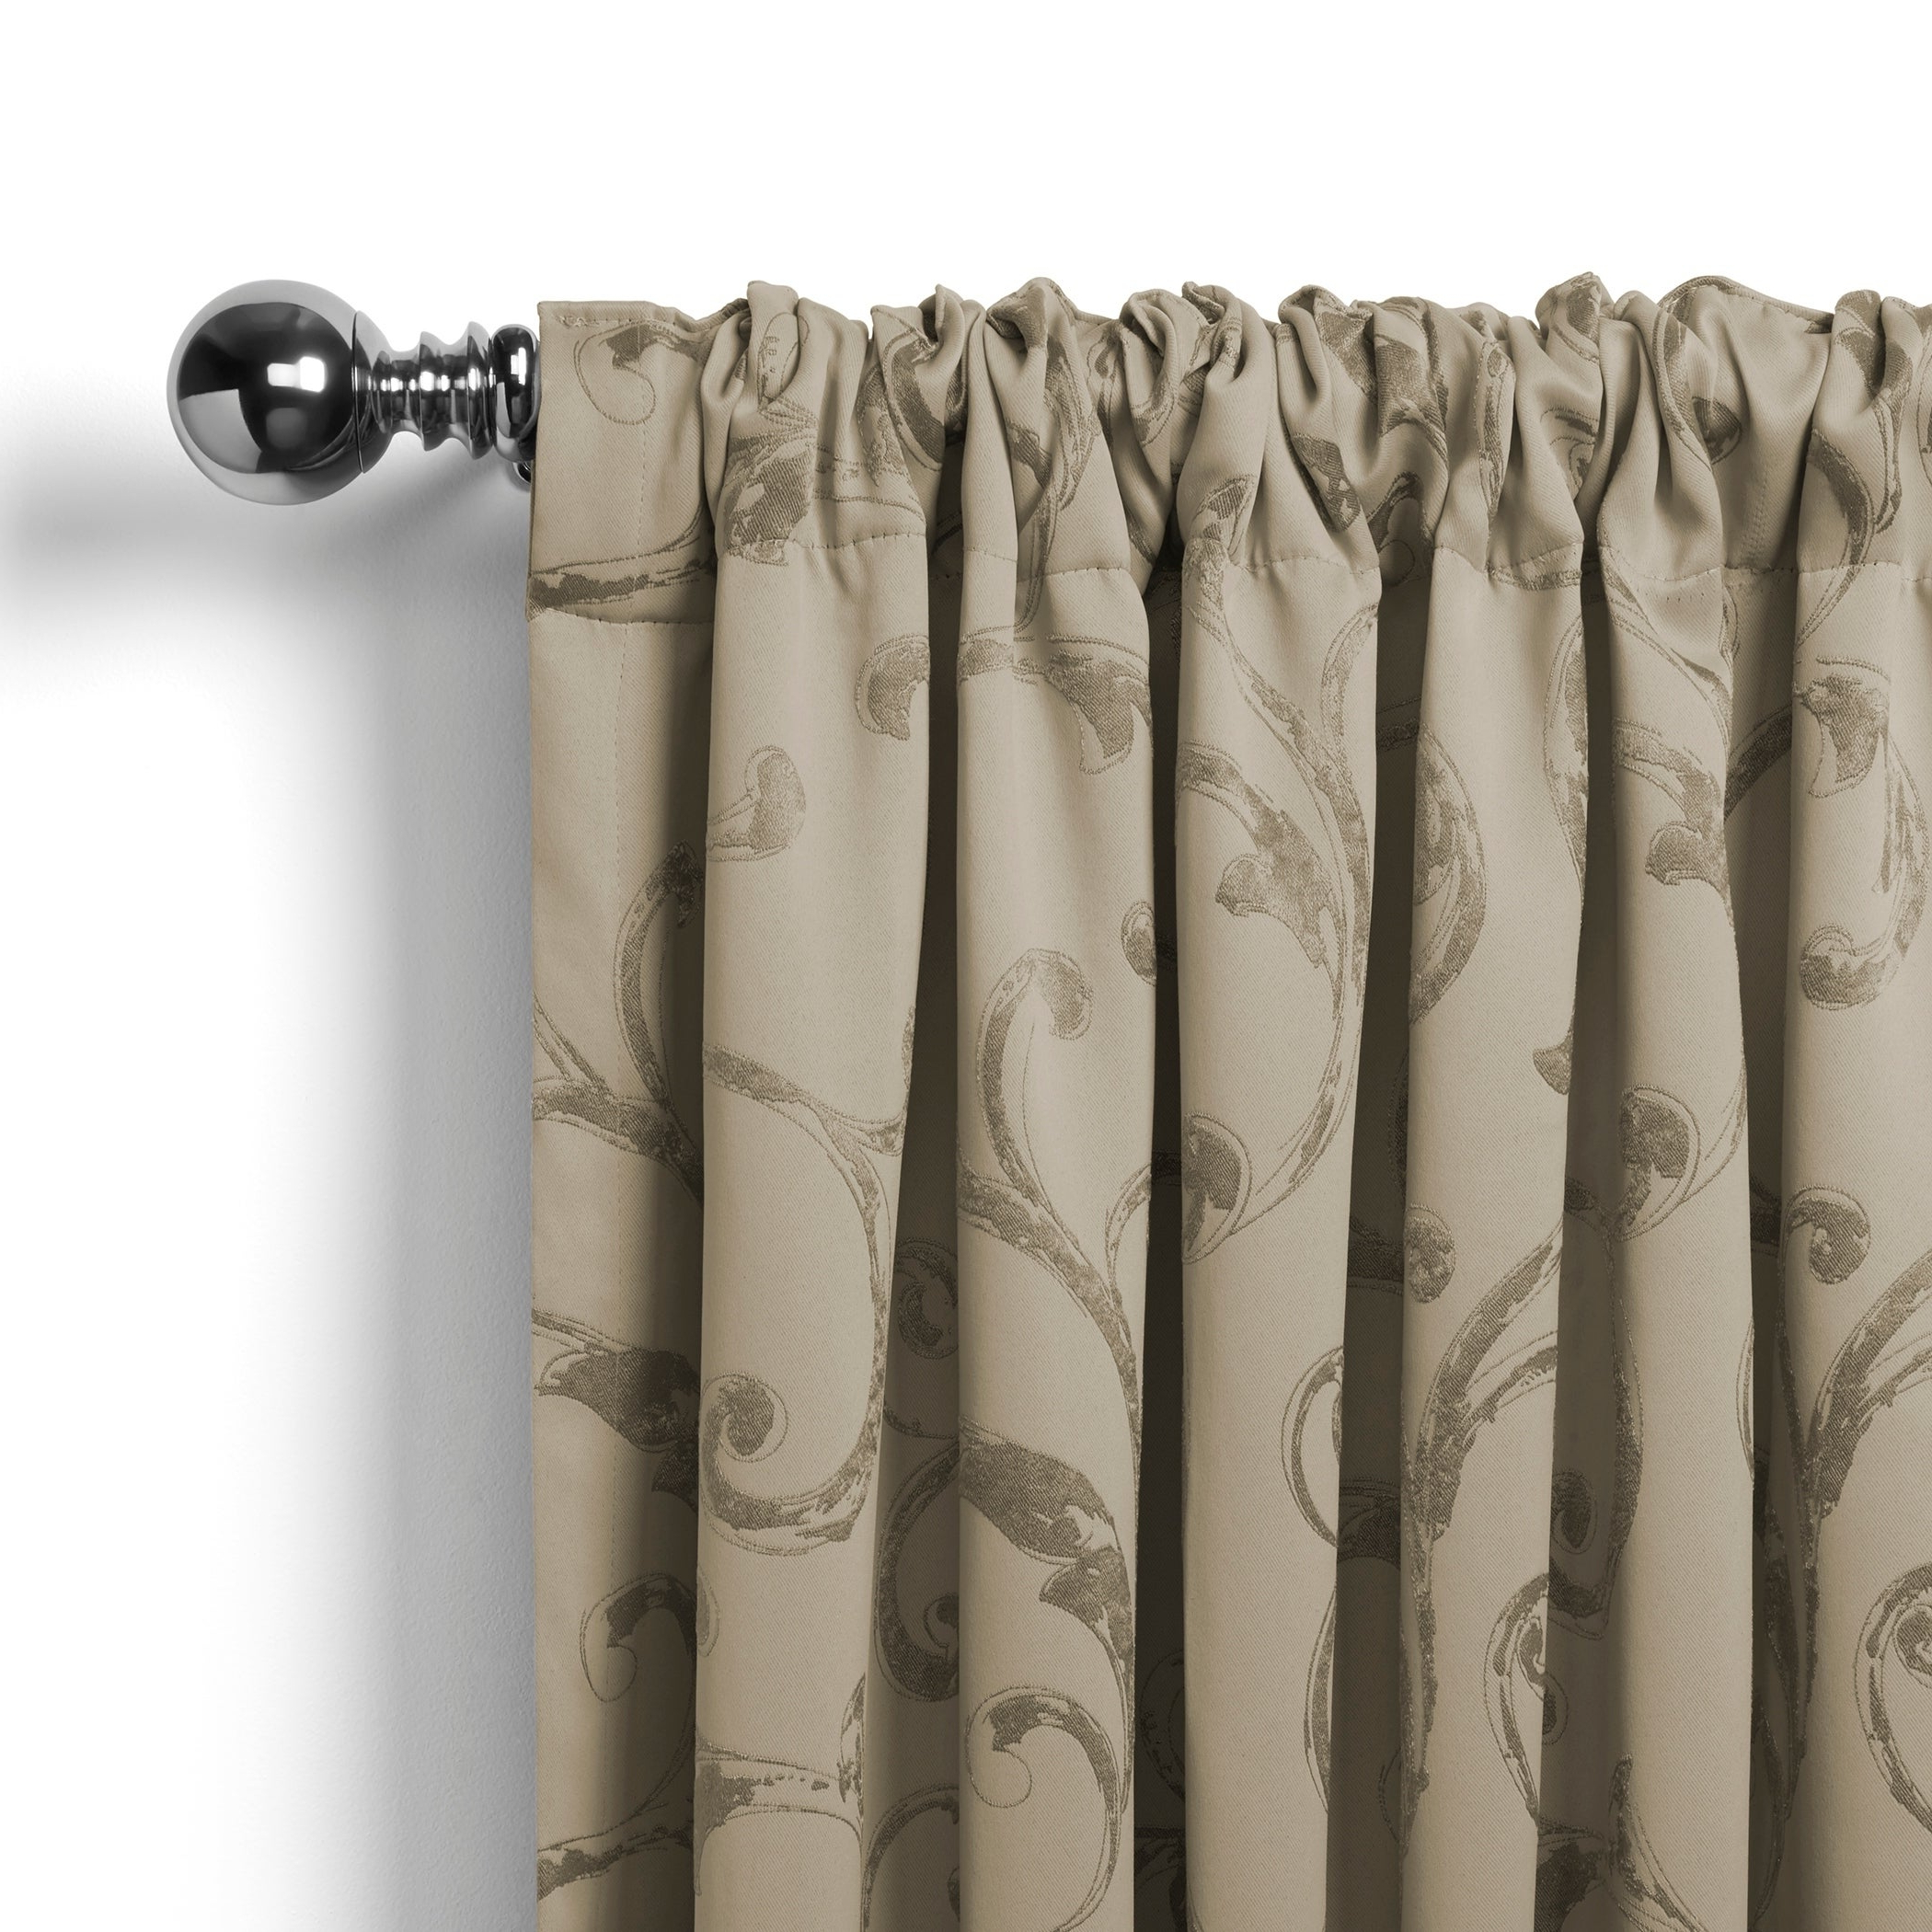 Elrene Mia Jacquard Blackout Curtain Panels Within Newest Elrene Mia Jacquard Blackout Curtain Panel (Gallery 2 of 20)